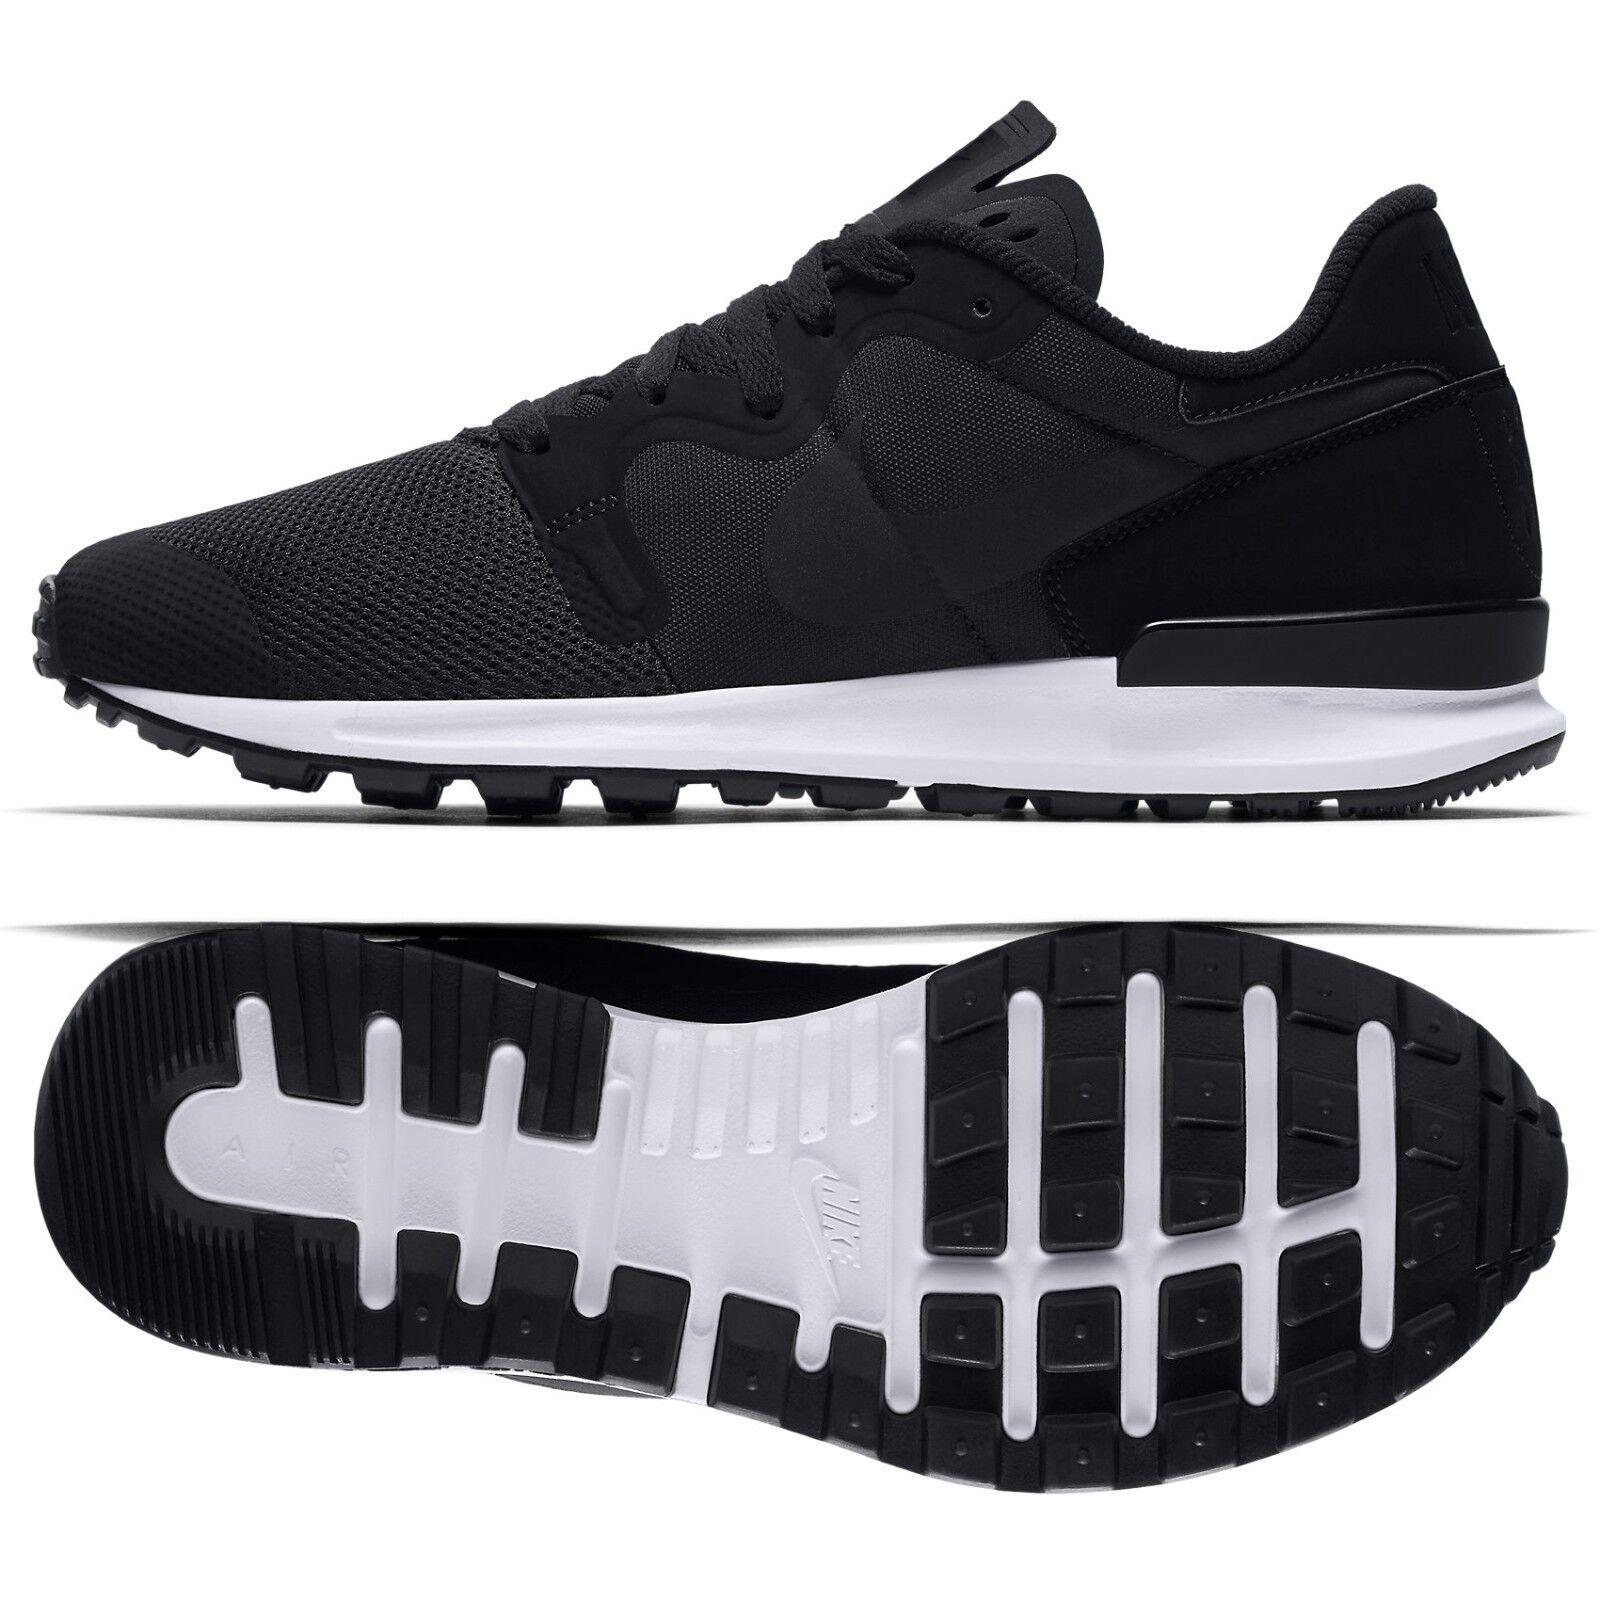 Nike Air Berwuda 555305-004 Black White Canvas Suede Mesh Men's shoes